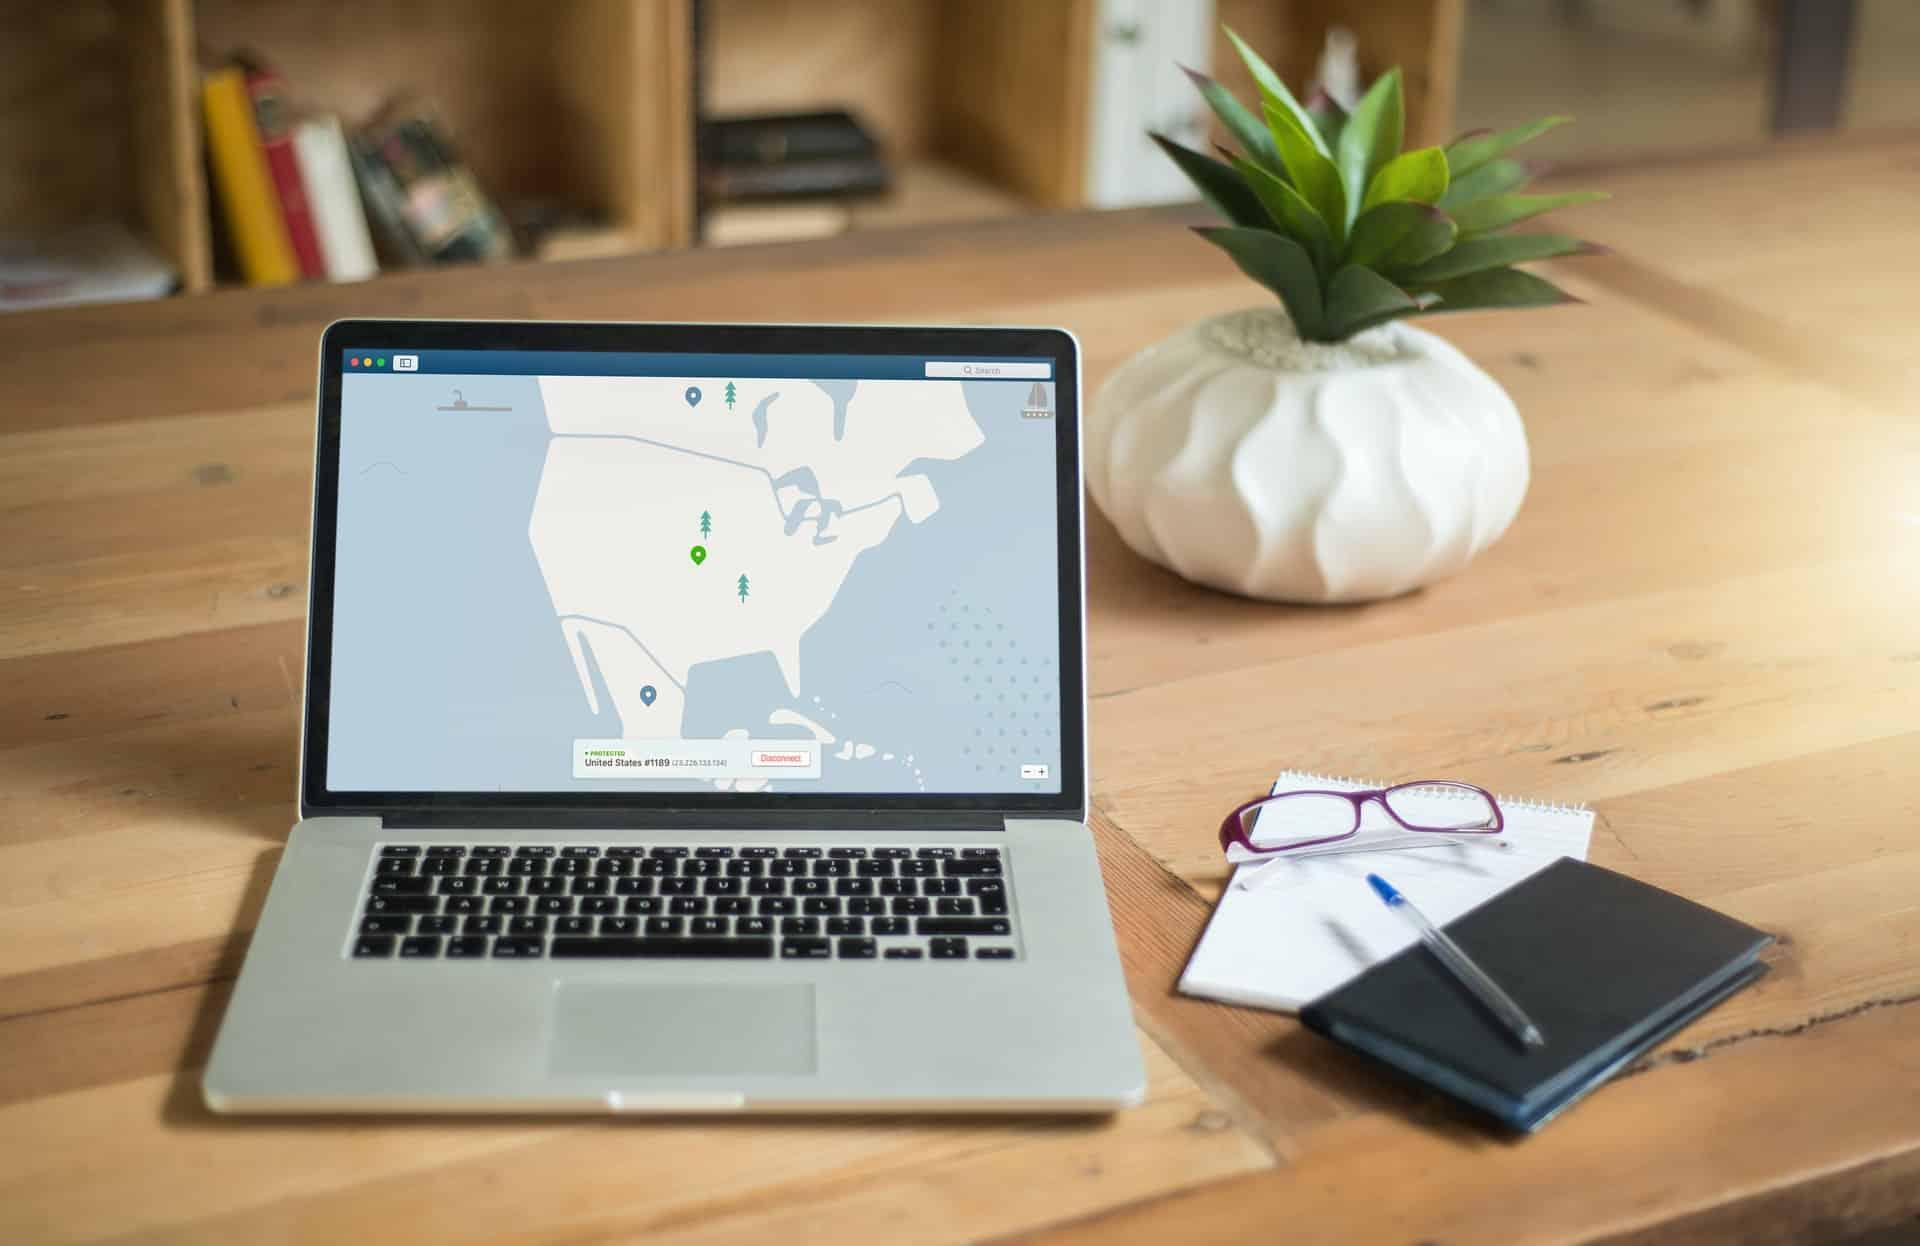 VPN location map on laptop